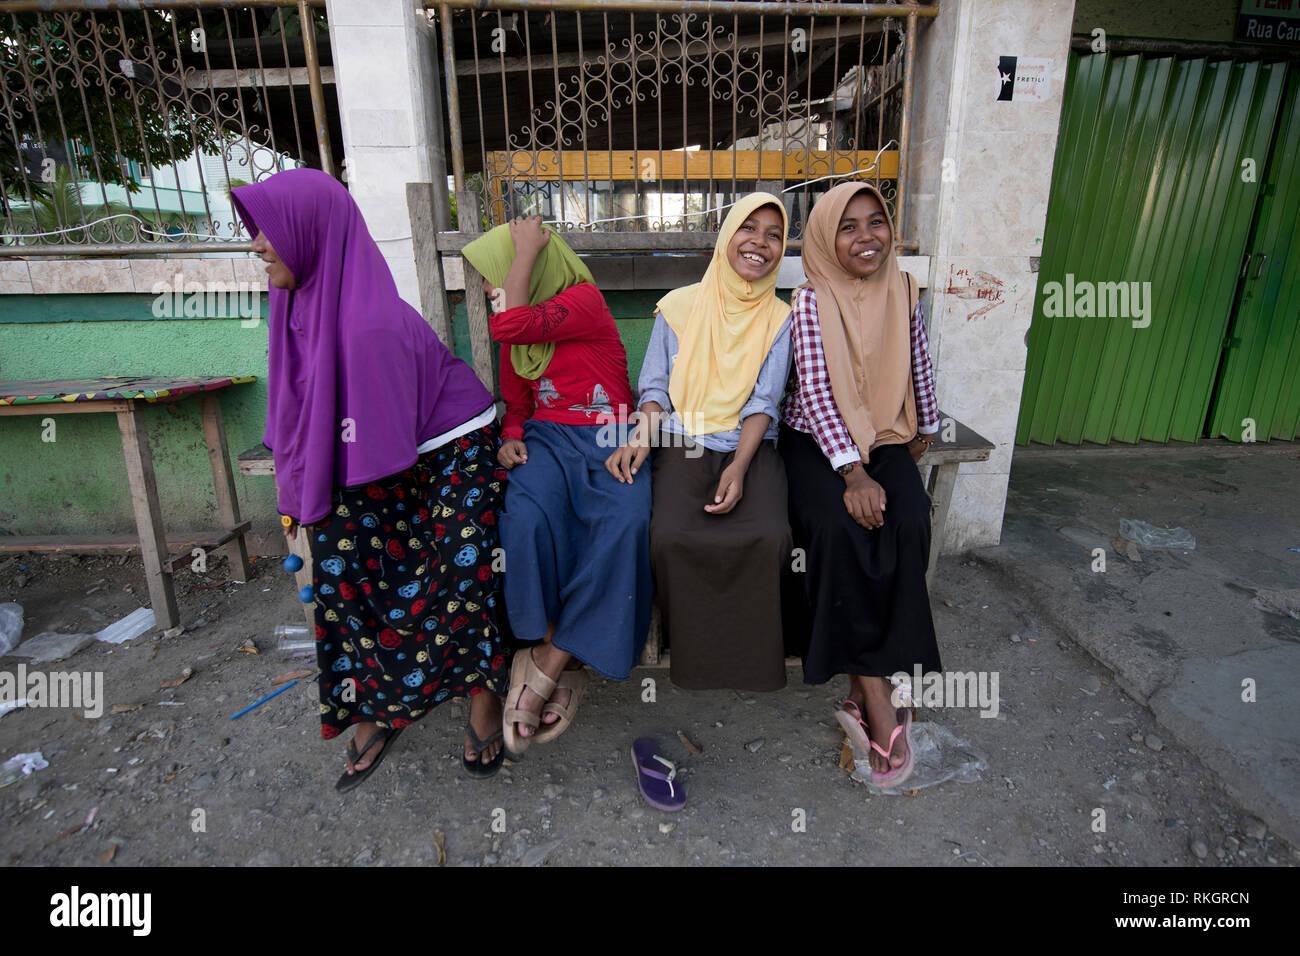 Moslem girls, Laughing Muslim girls wearing hijabs, Dili, East Timor (Timor Leste) - Stock Image